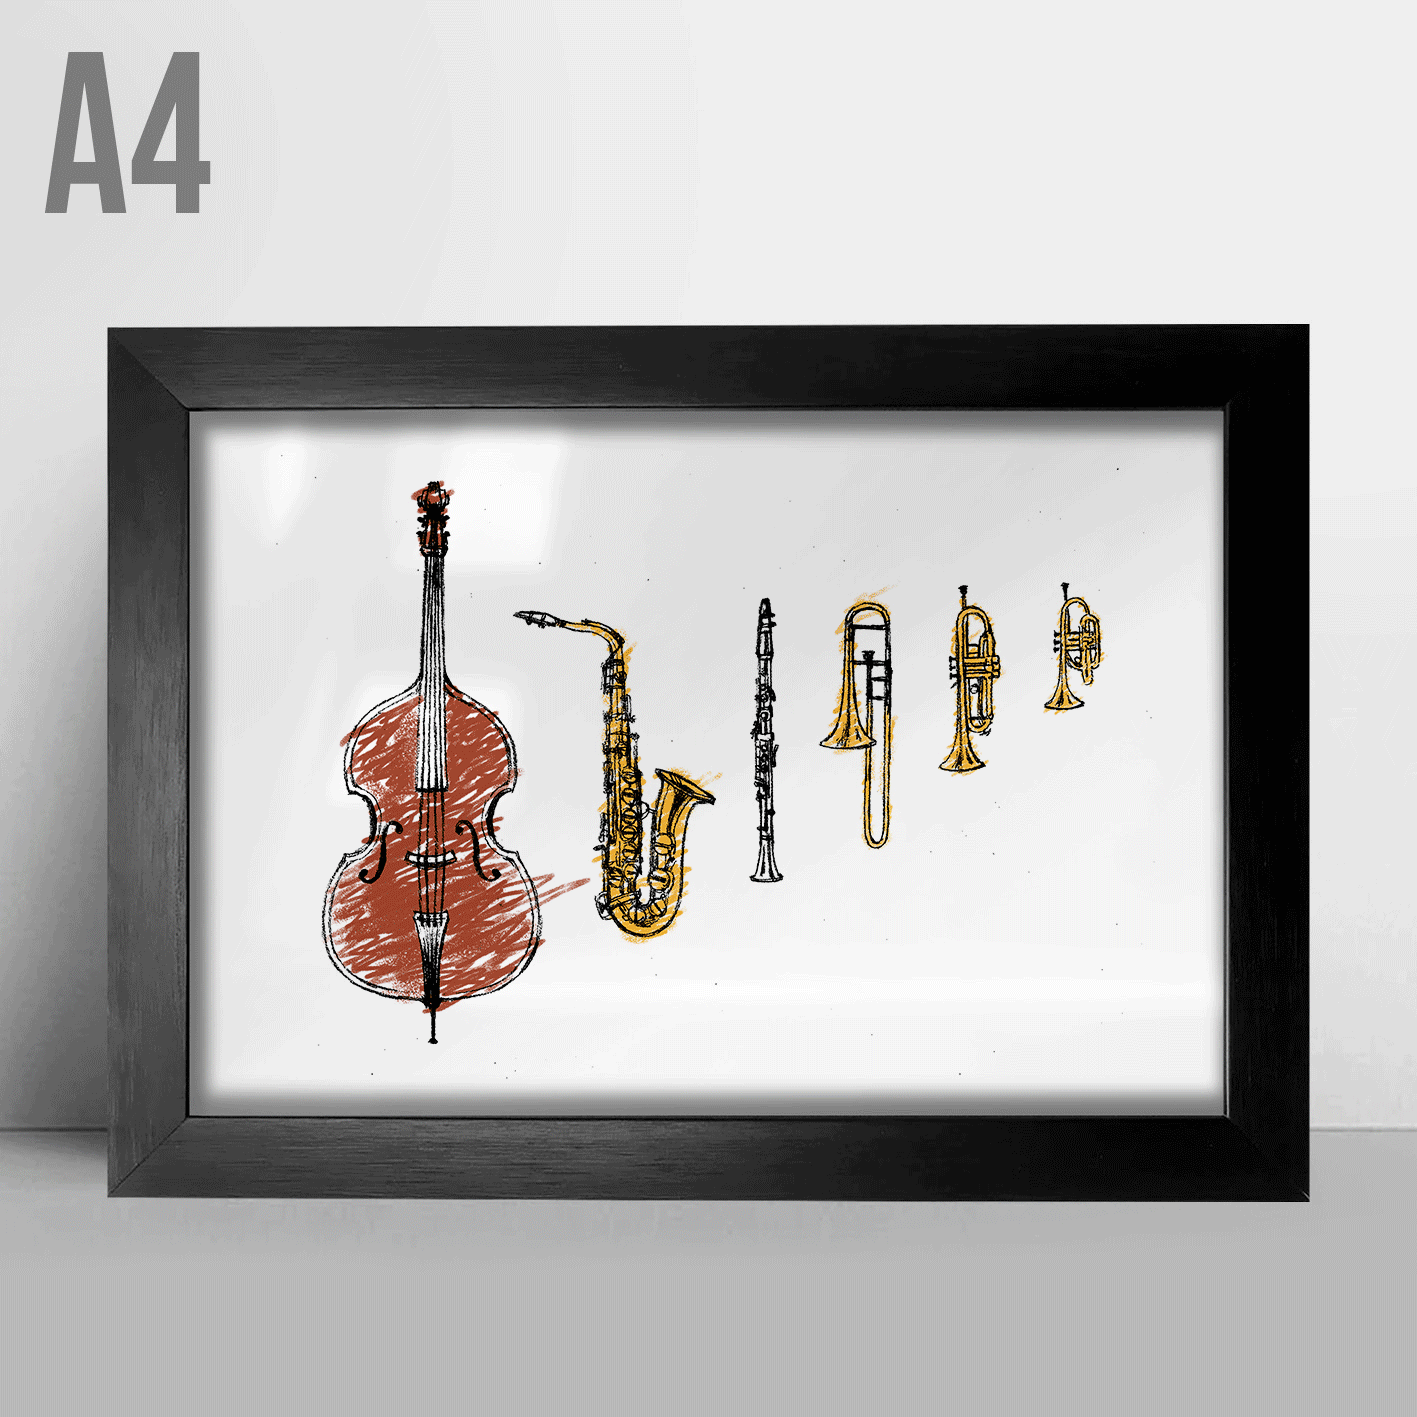 Quadro A4 - Jazz Instruments